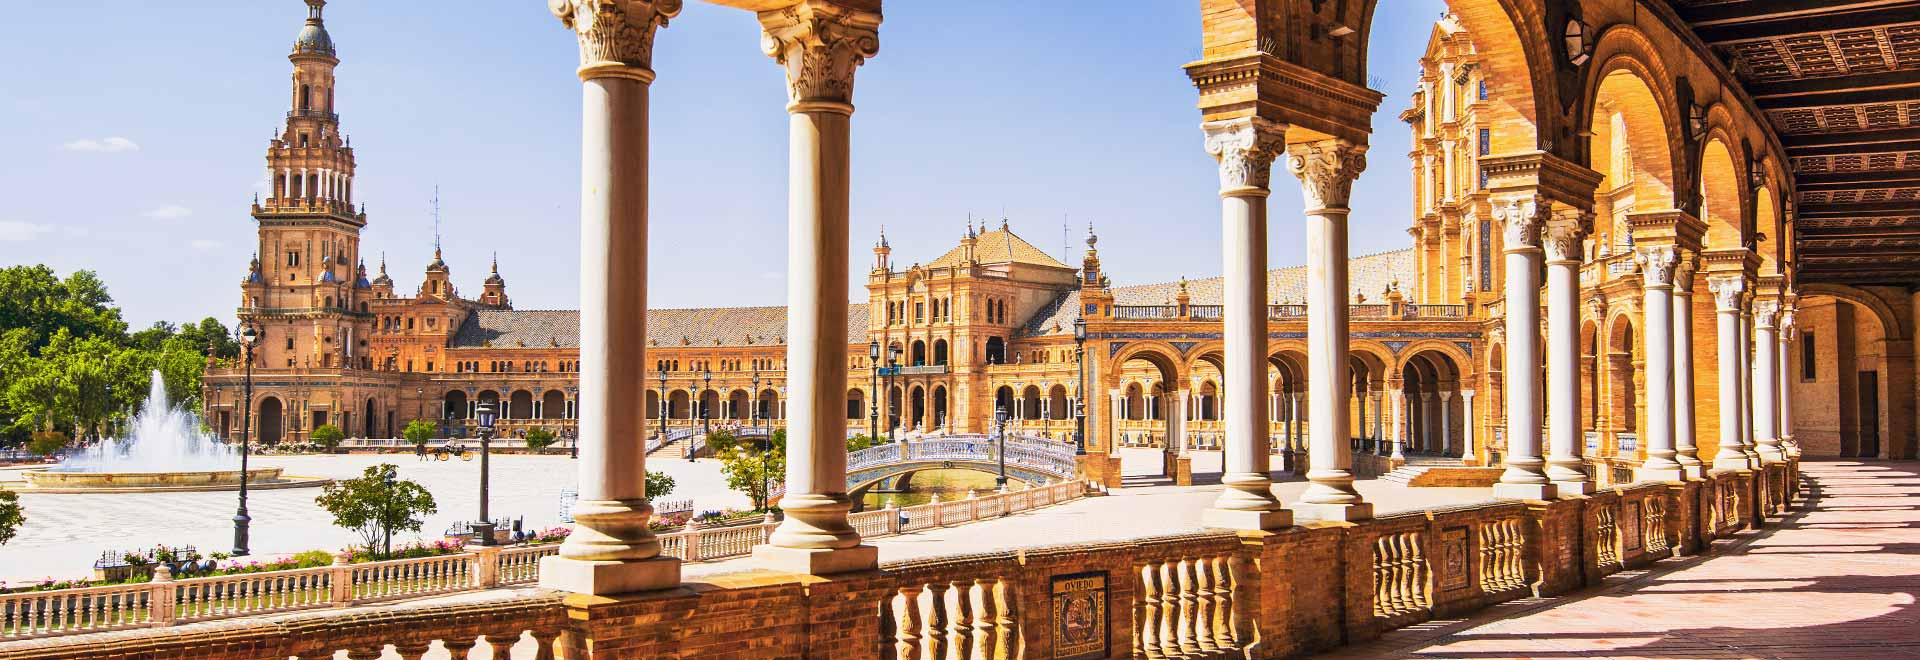 Spain Luxury Tours: Luxury Travel Spain | Abercrombie & Kent